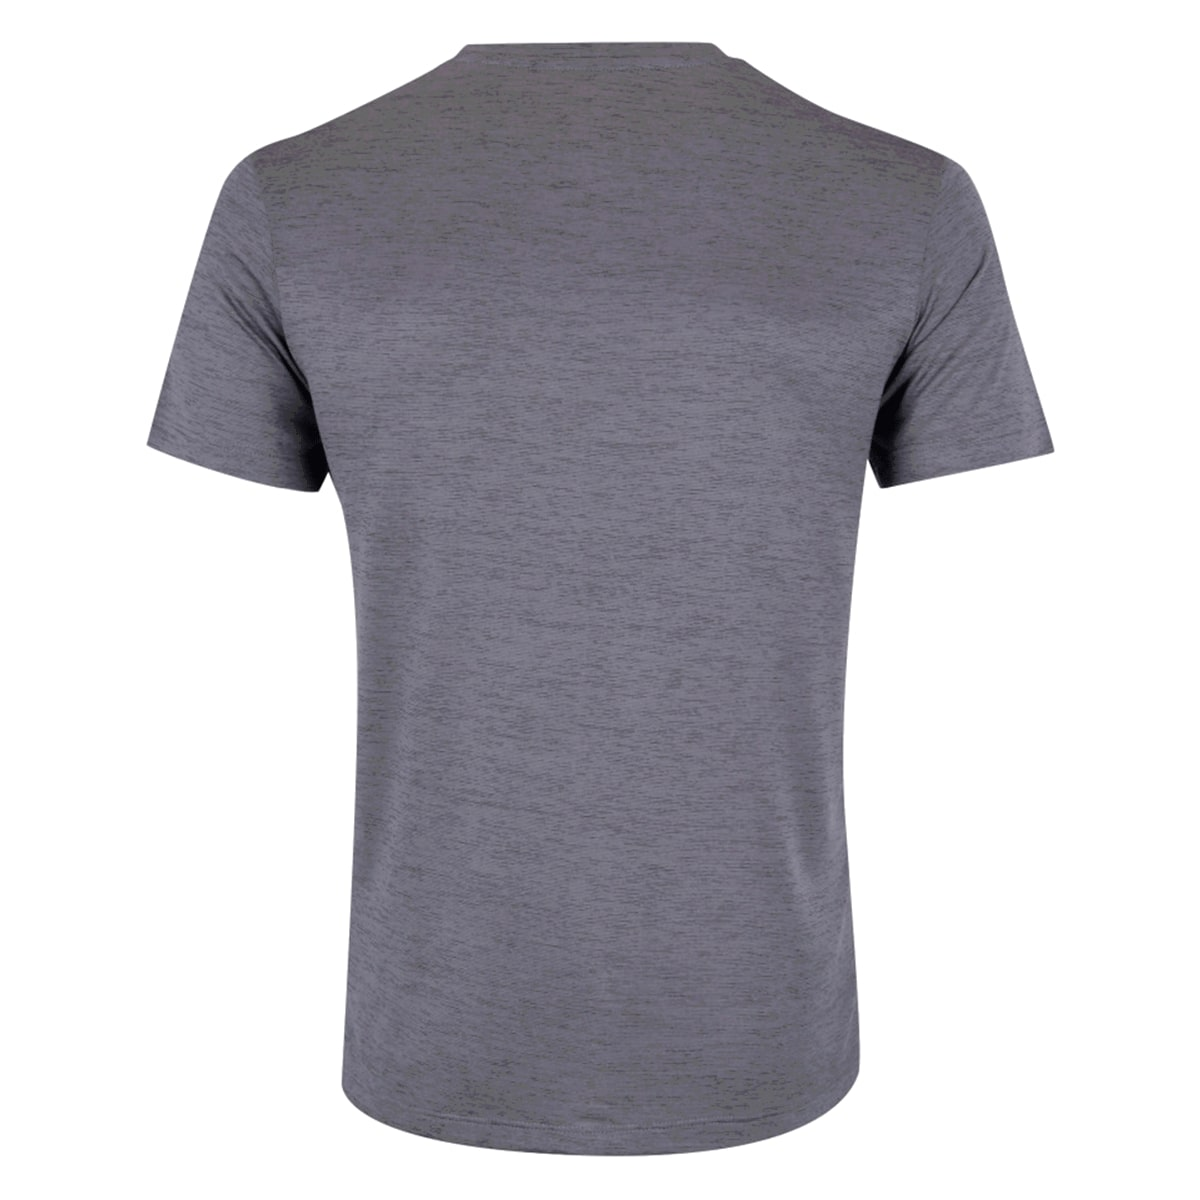 Camiseta Asics Japan SS Tee Masculina Cinza Preto